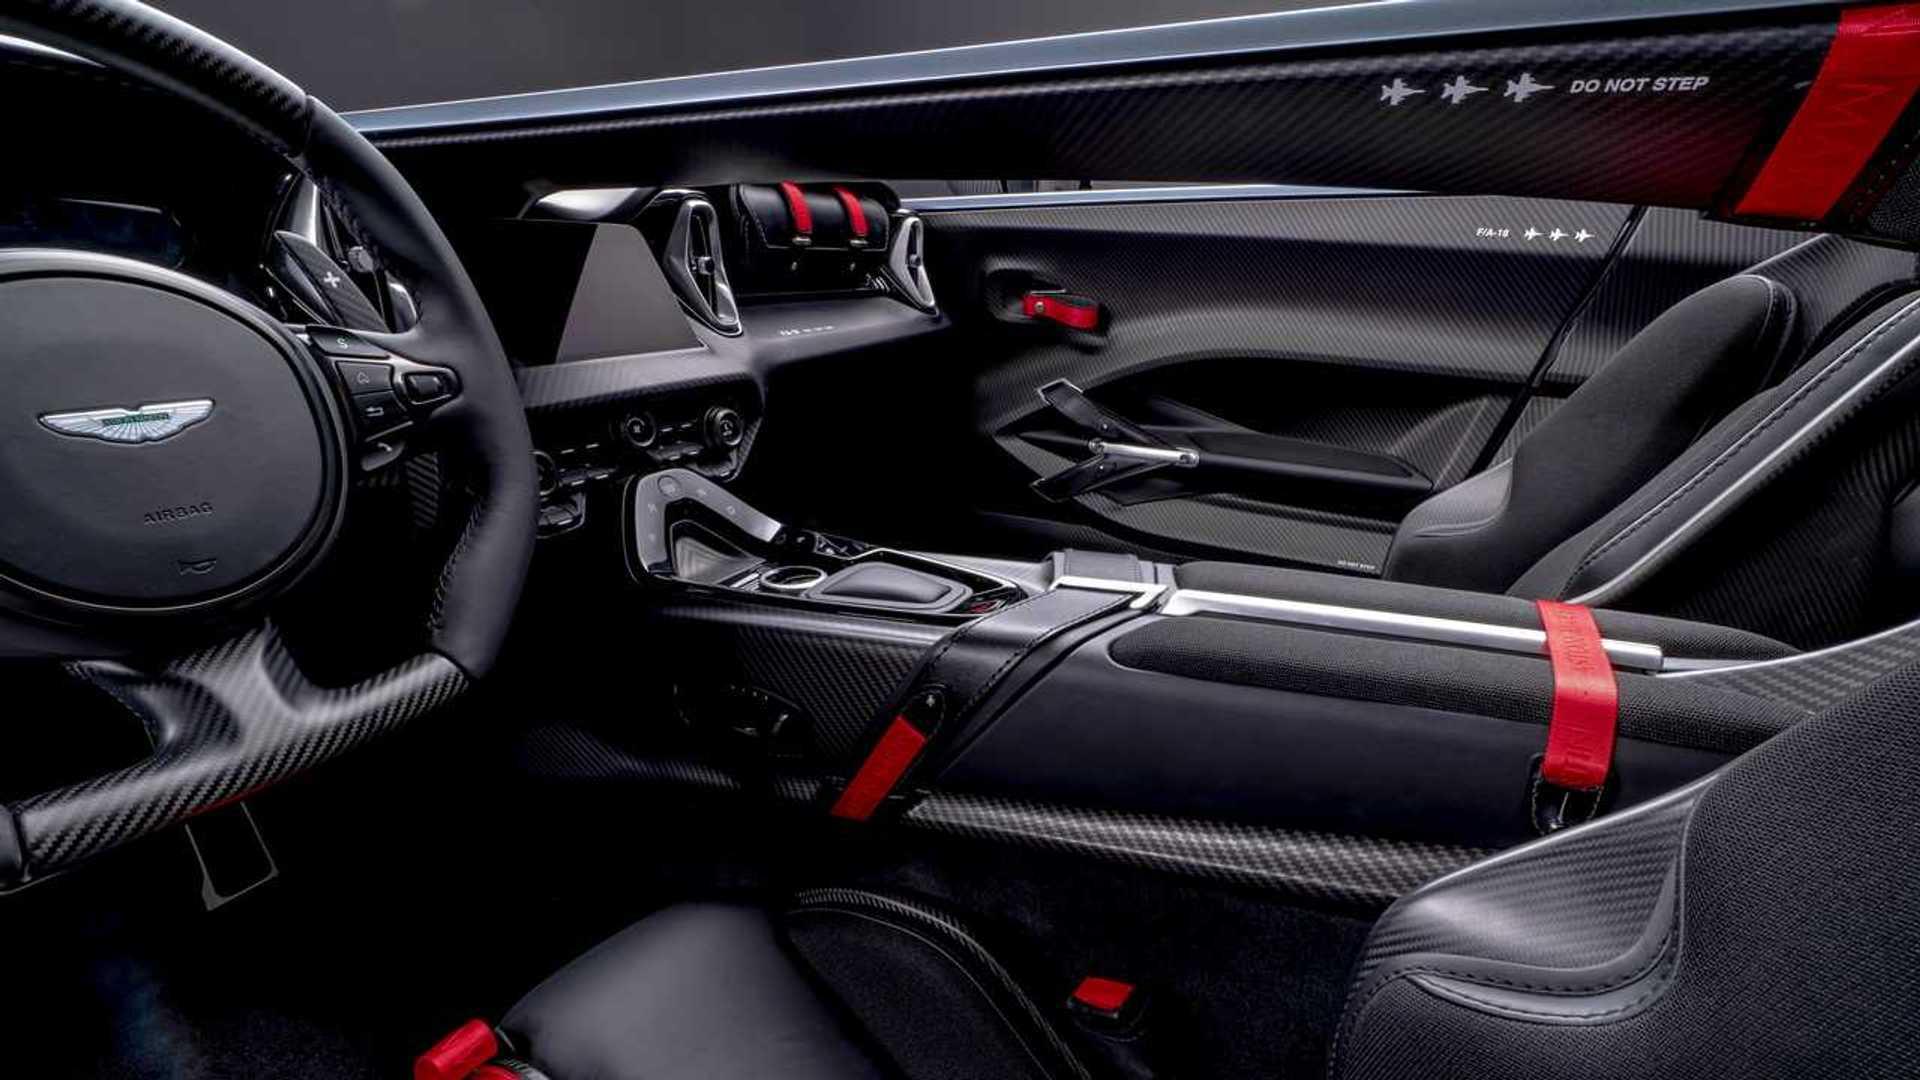 Aston Martin V12 Speedster 2021 Hanya Dibuat 88 Unit Dengan Harga 15 Milyar